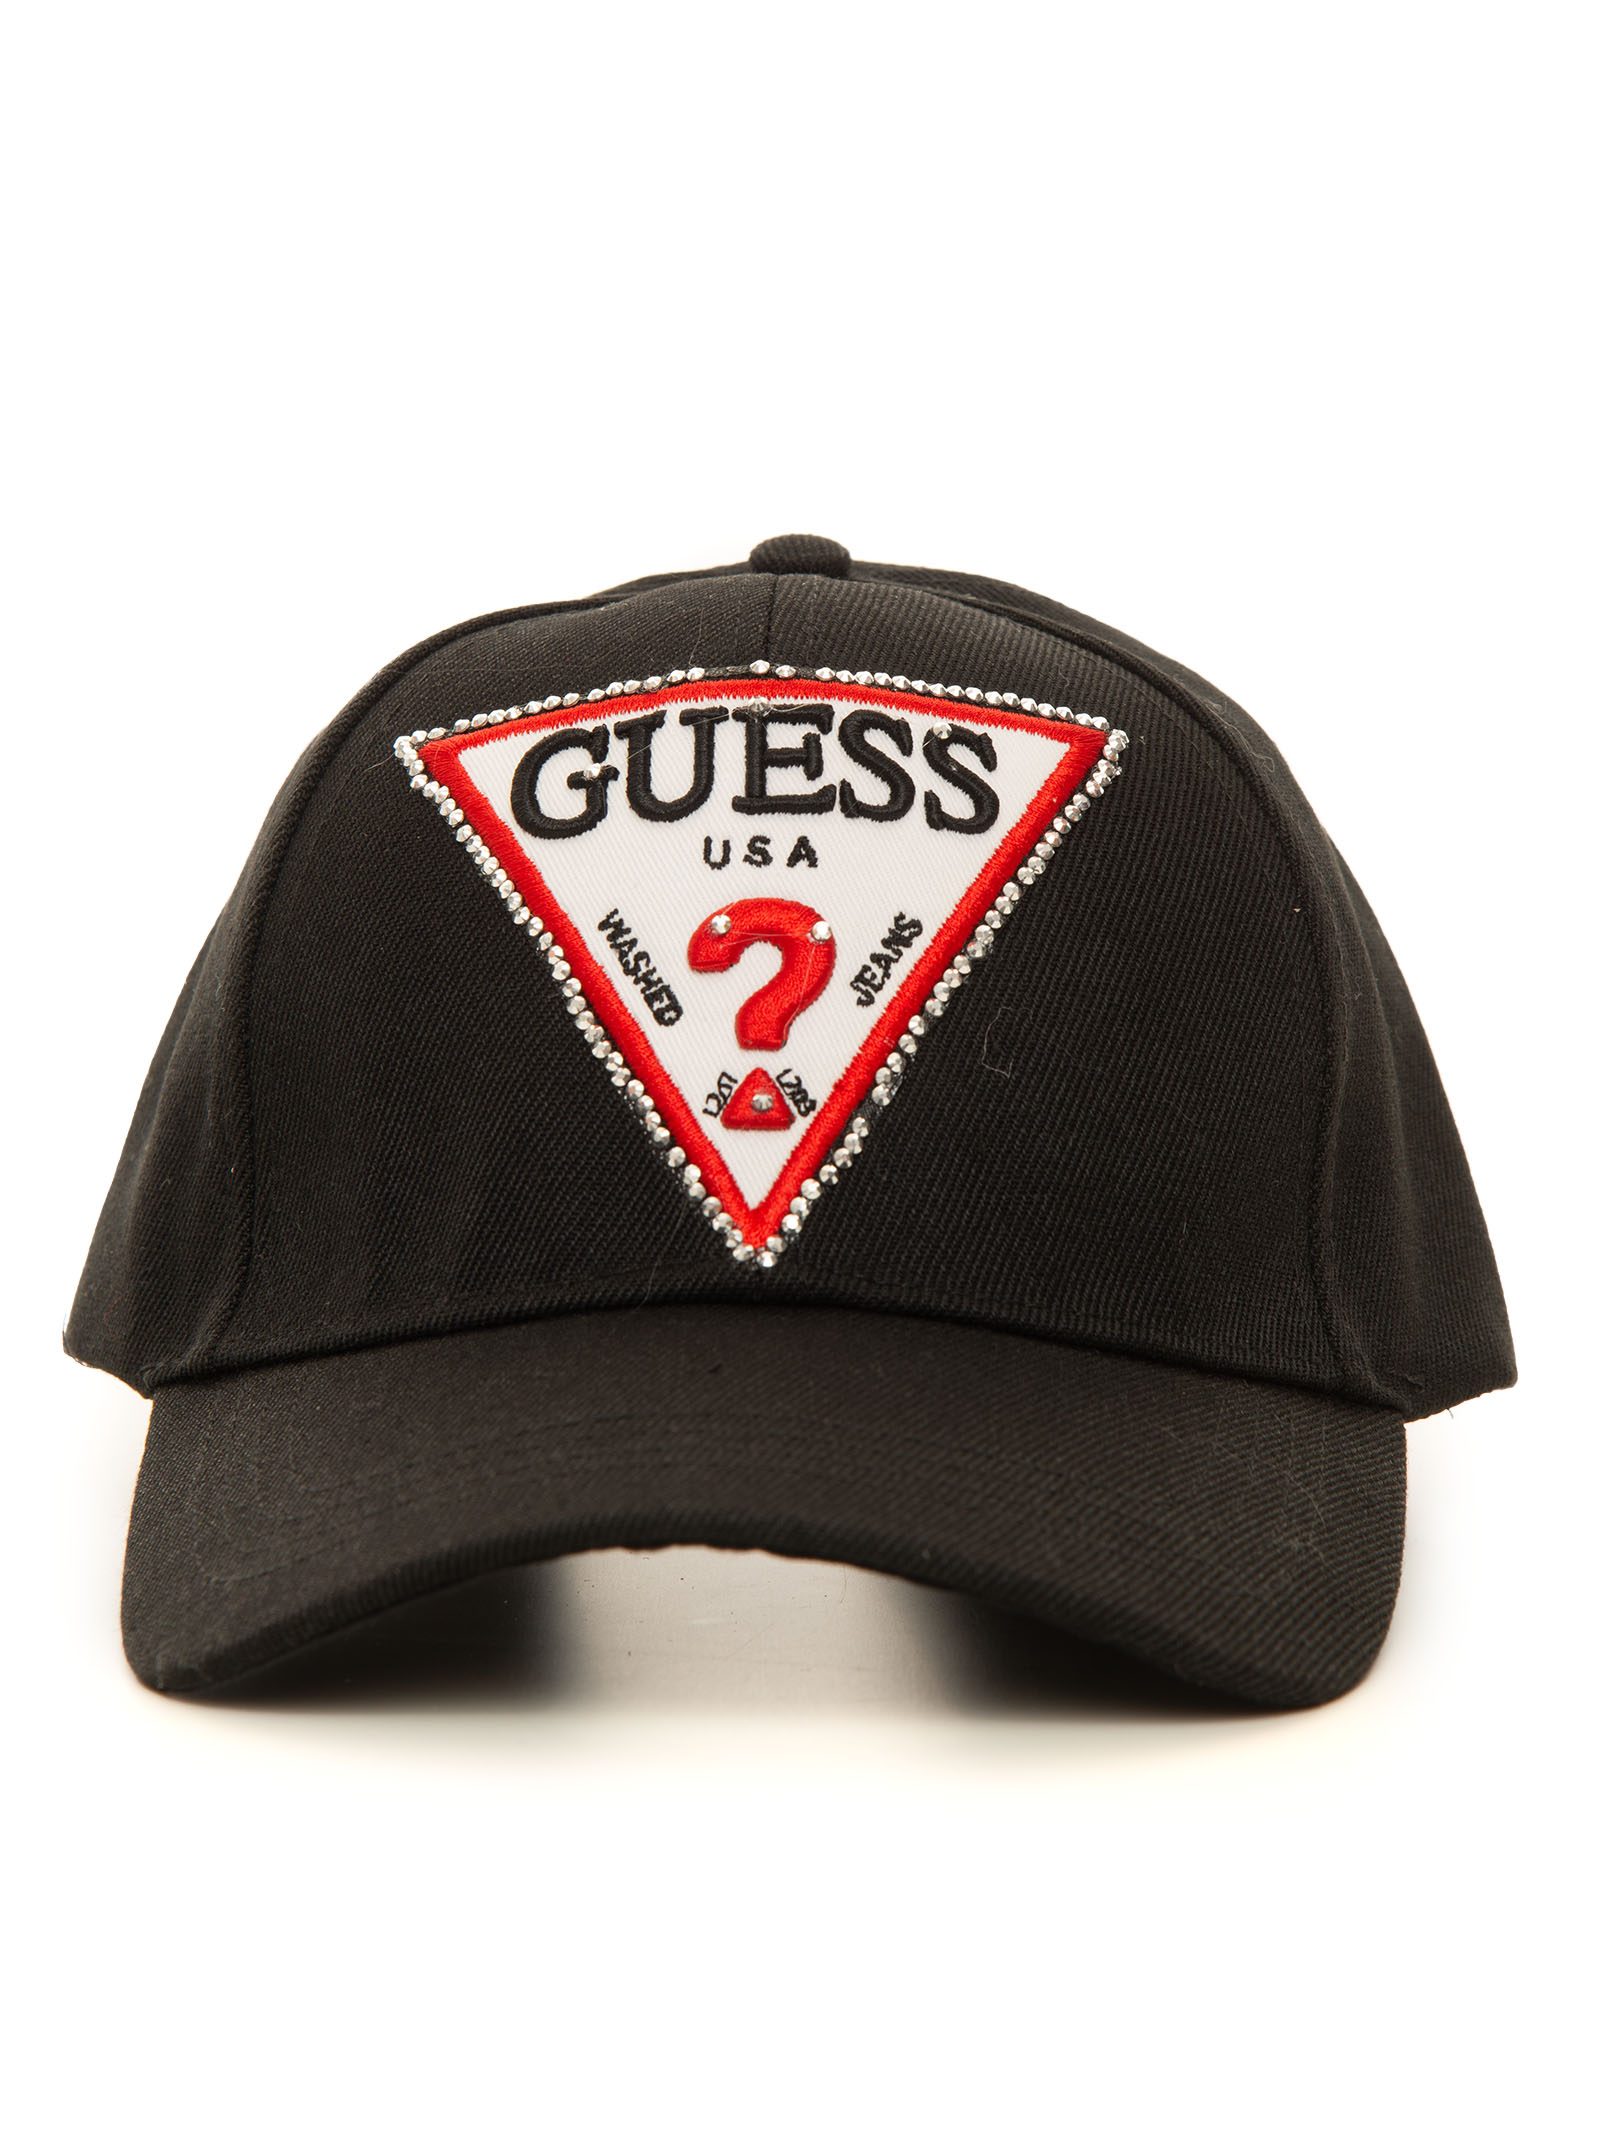 Guess Caps BASEBALL CAP BLACK POLYESTER WOMAN